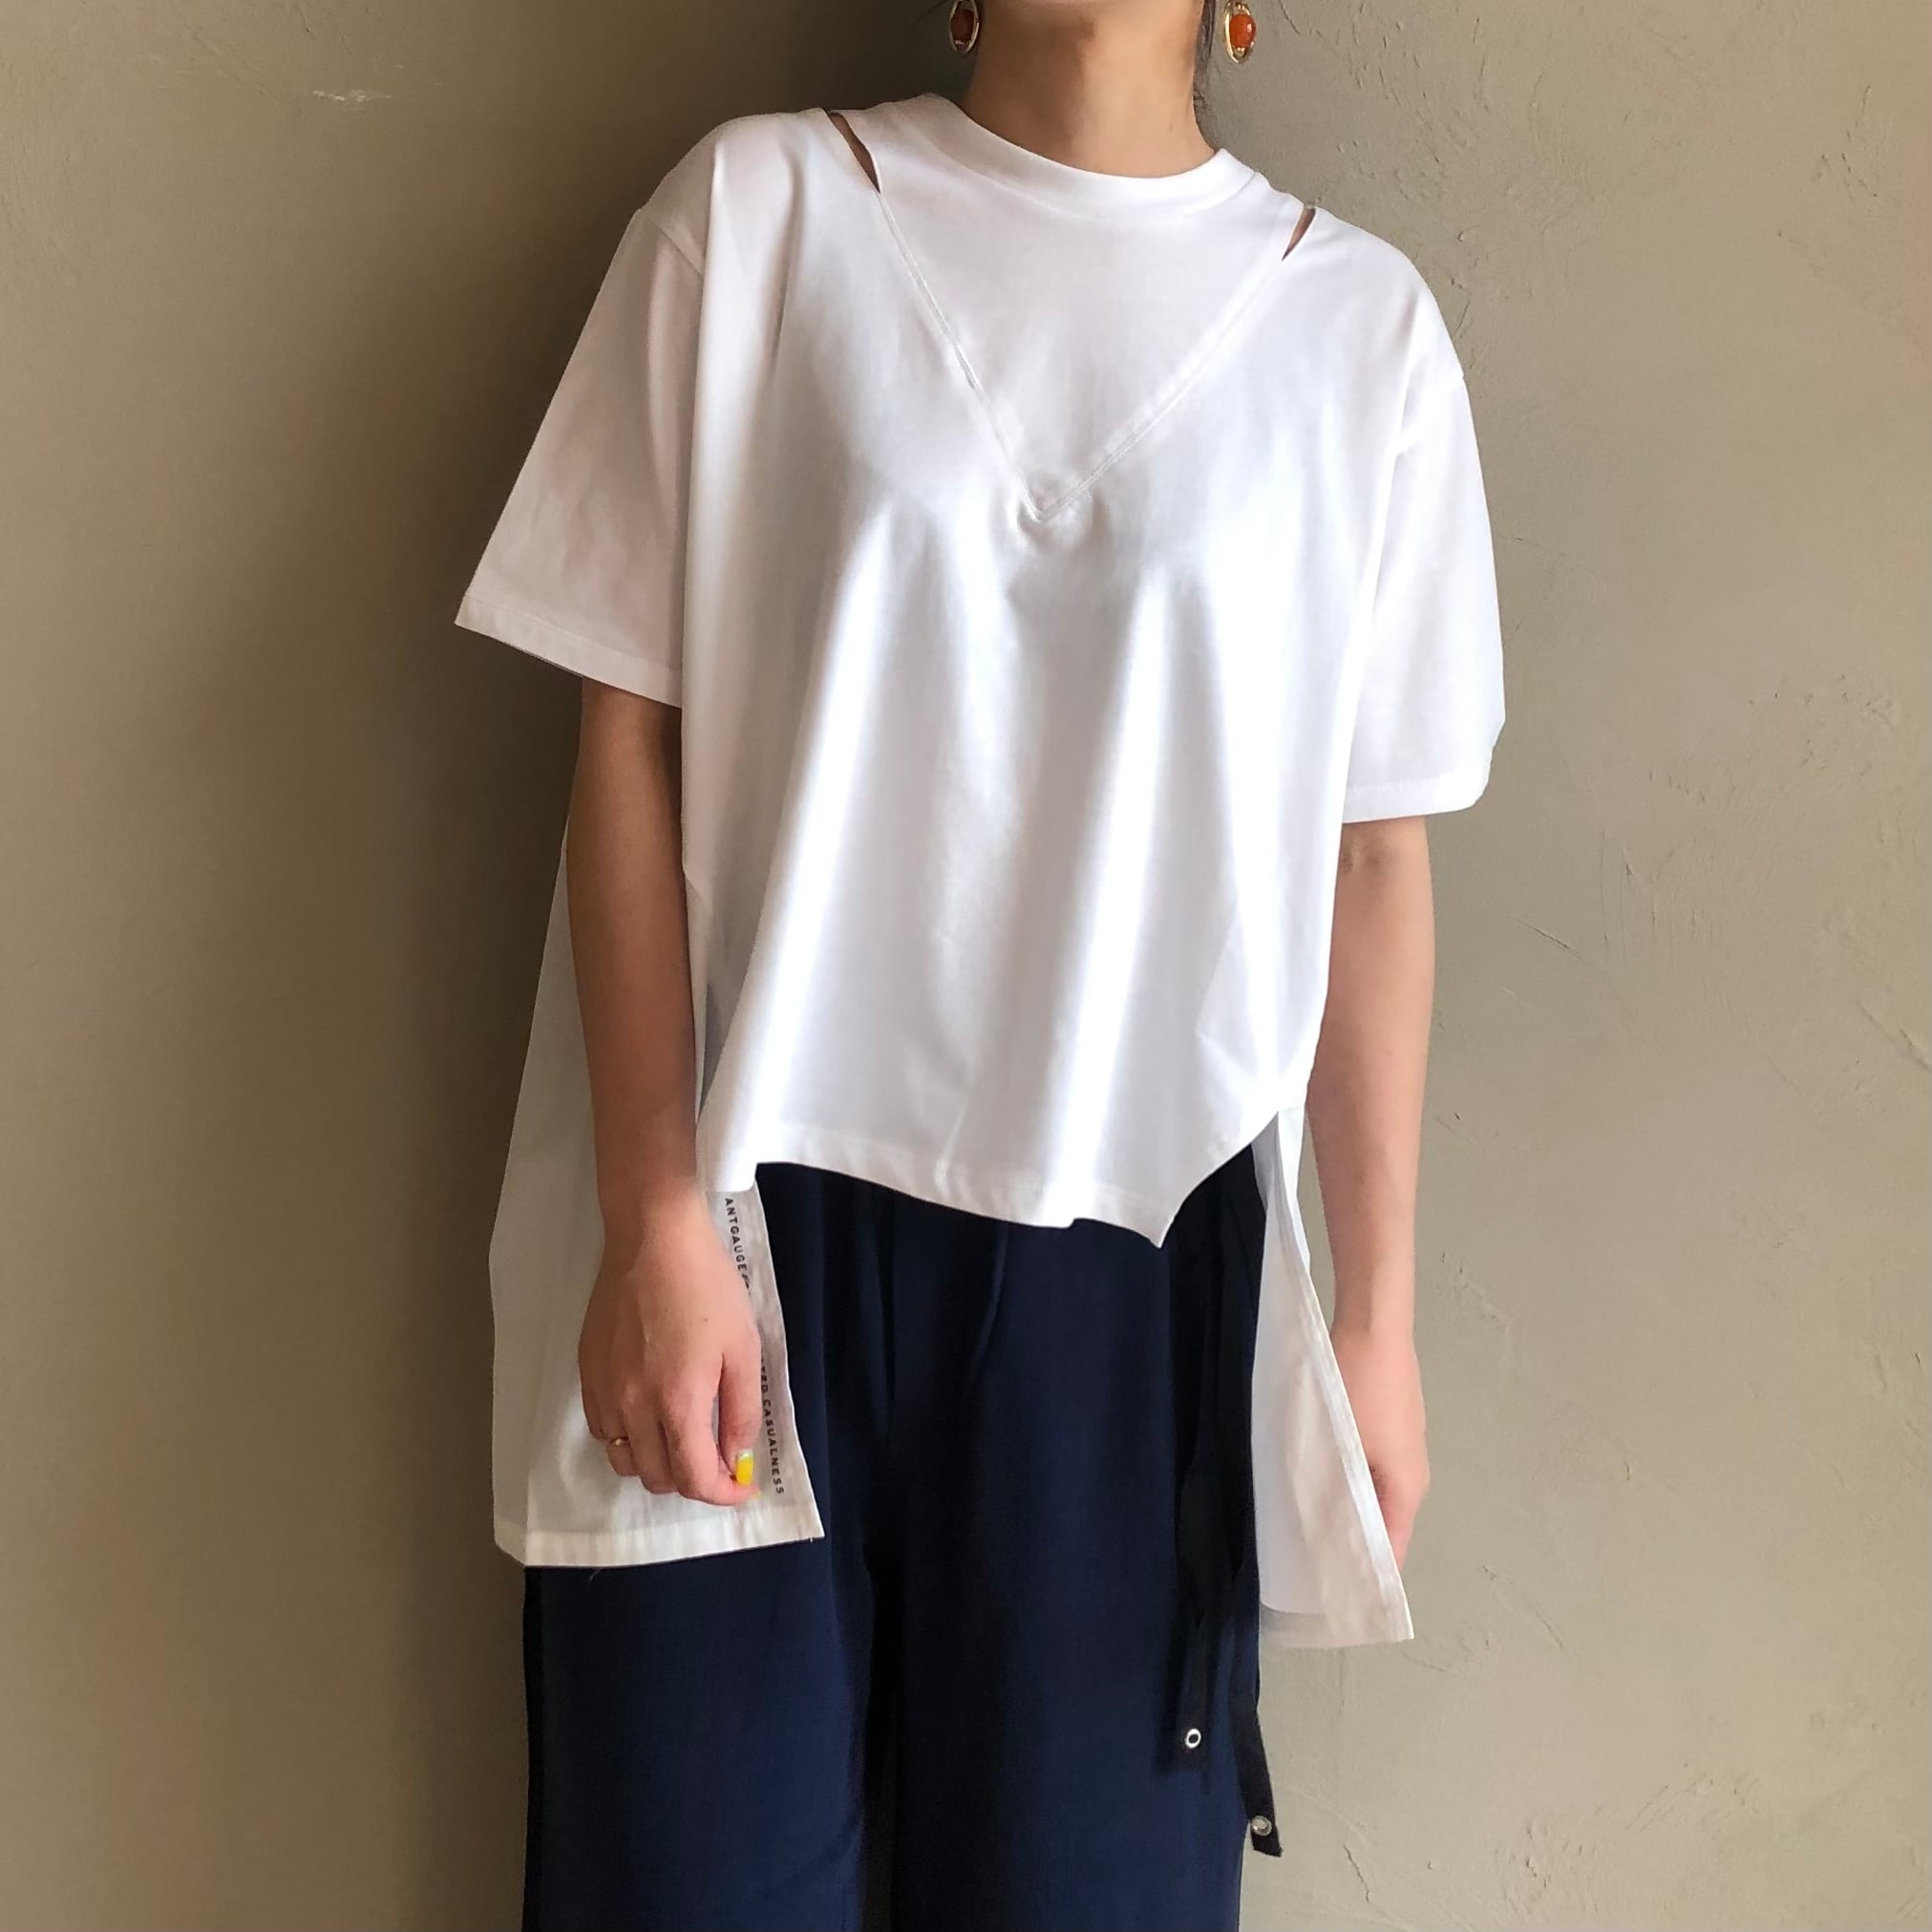 【 ANTGAUGE 】- AB959 - ネックスリット異素材ドッキングTシャツ